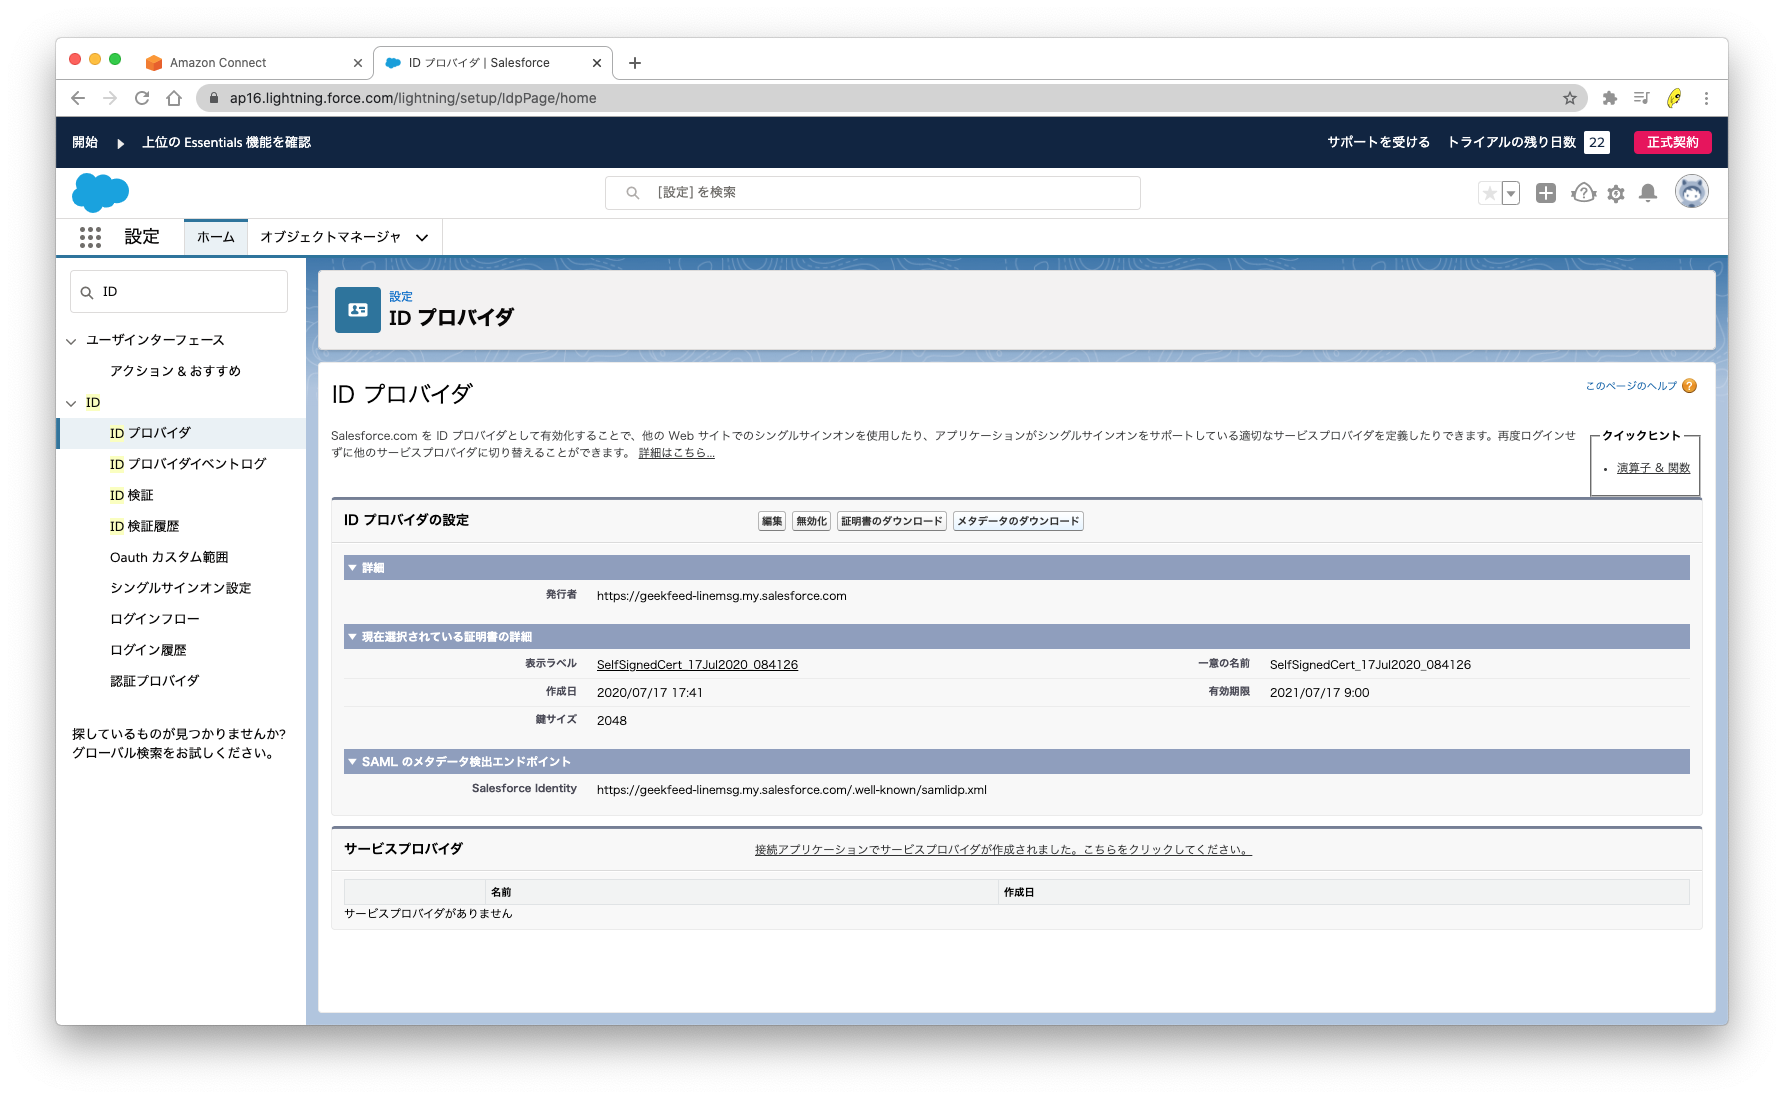 sfdc sso download metadata